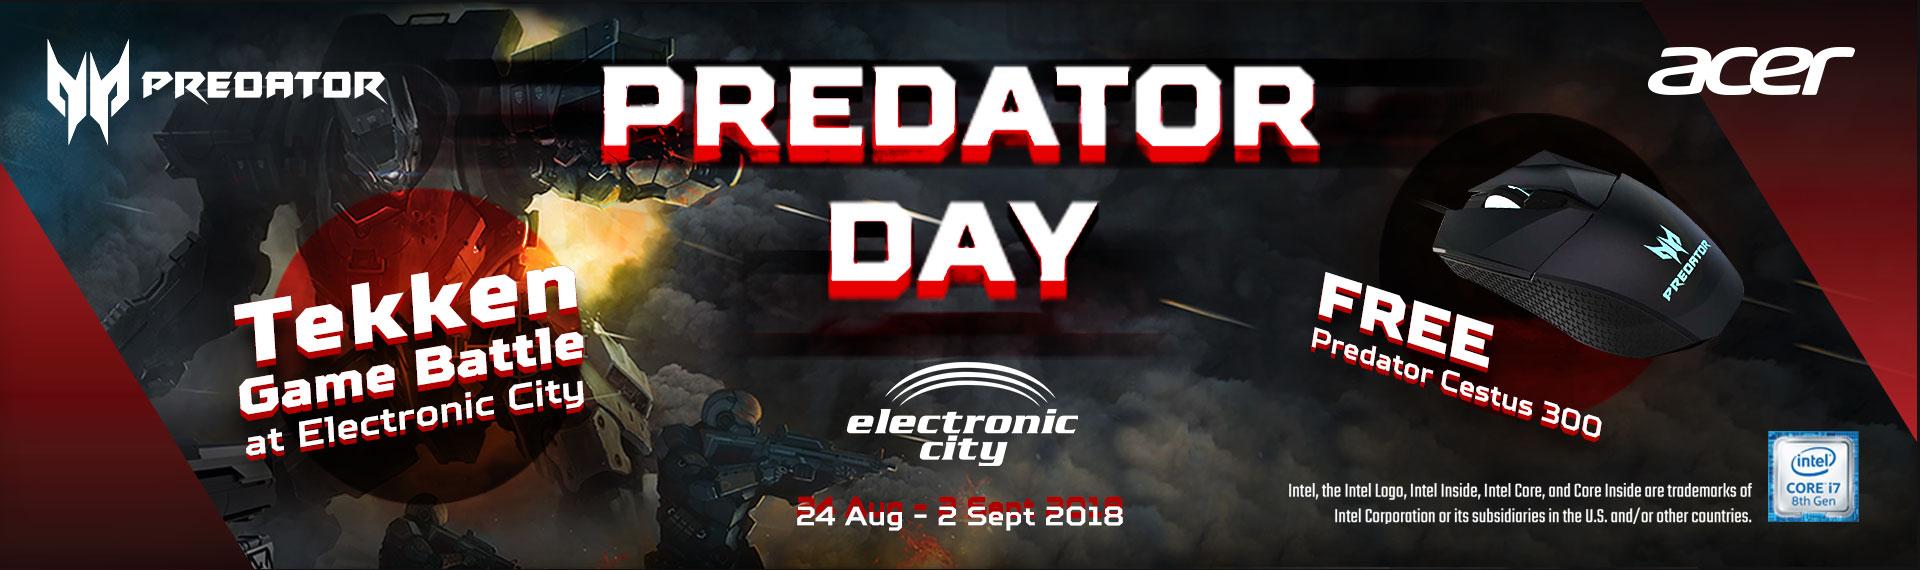 Semarak Predator Day, Beli Nitro 5 Gratis Predator Mouse Cestus 300!